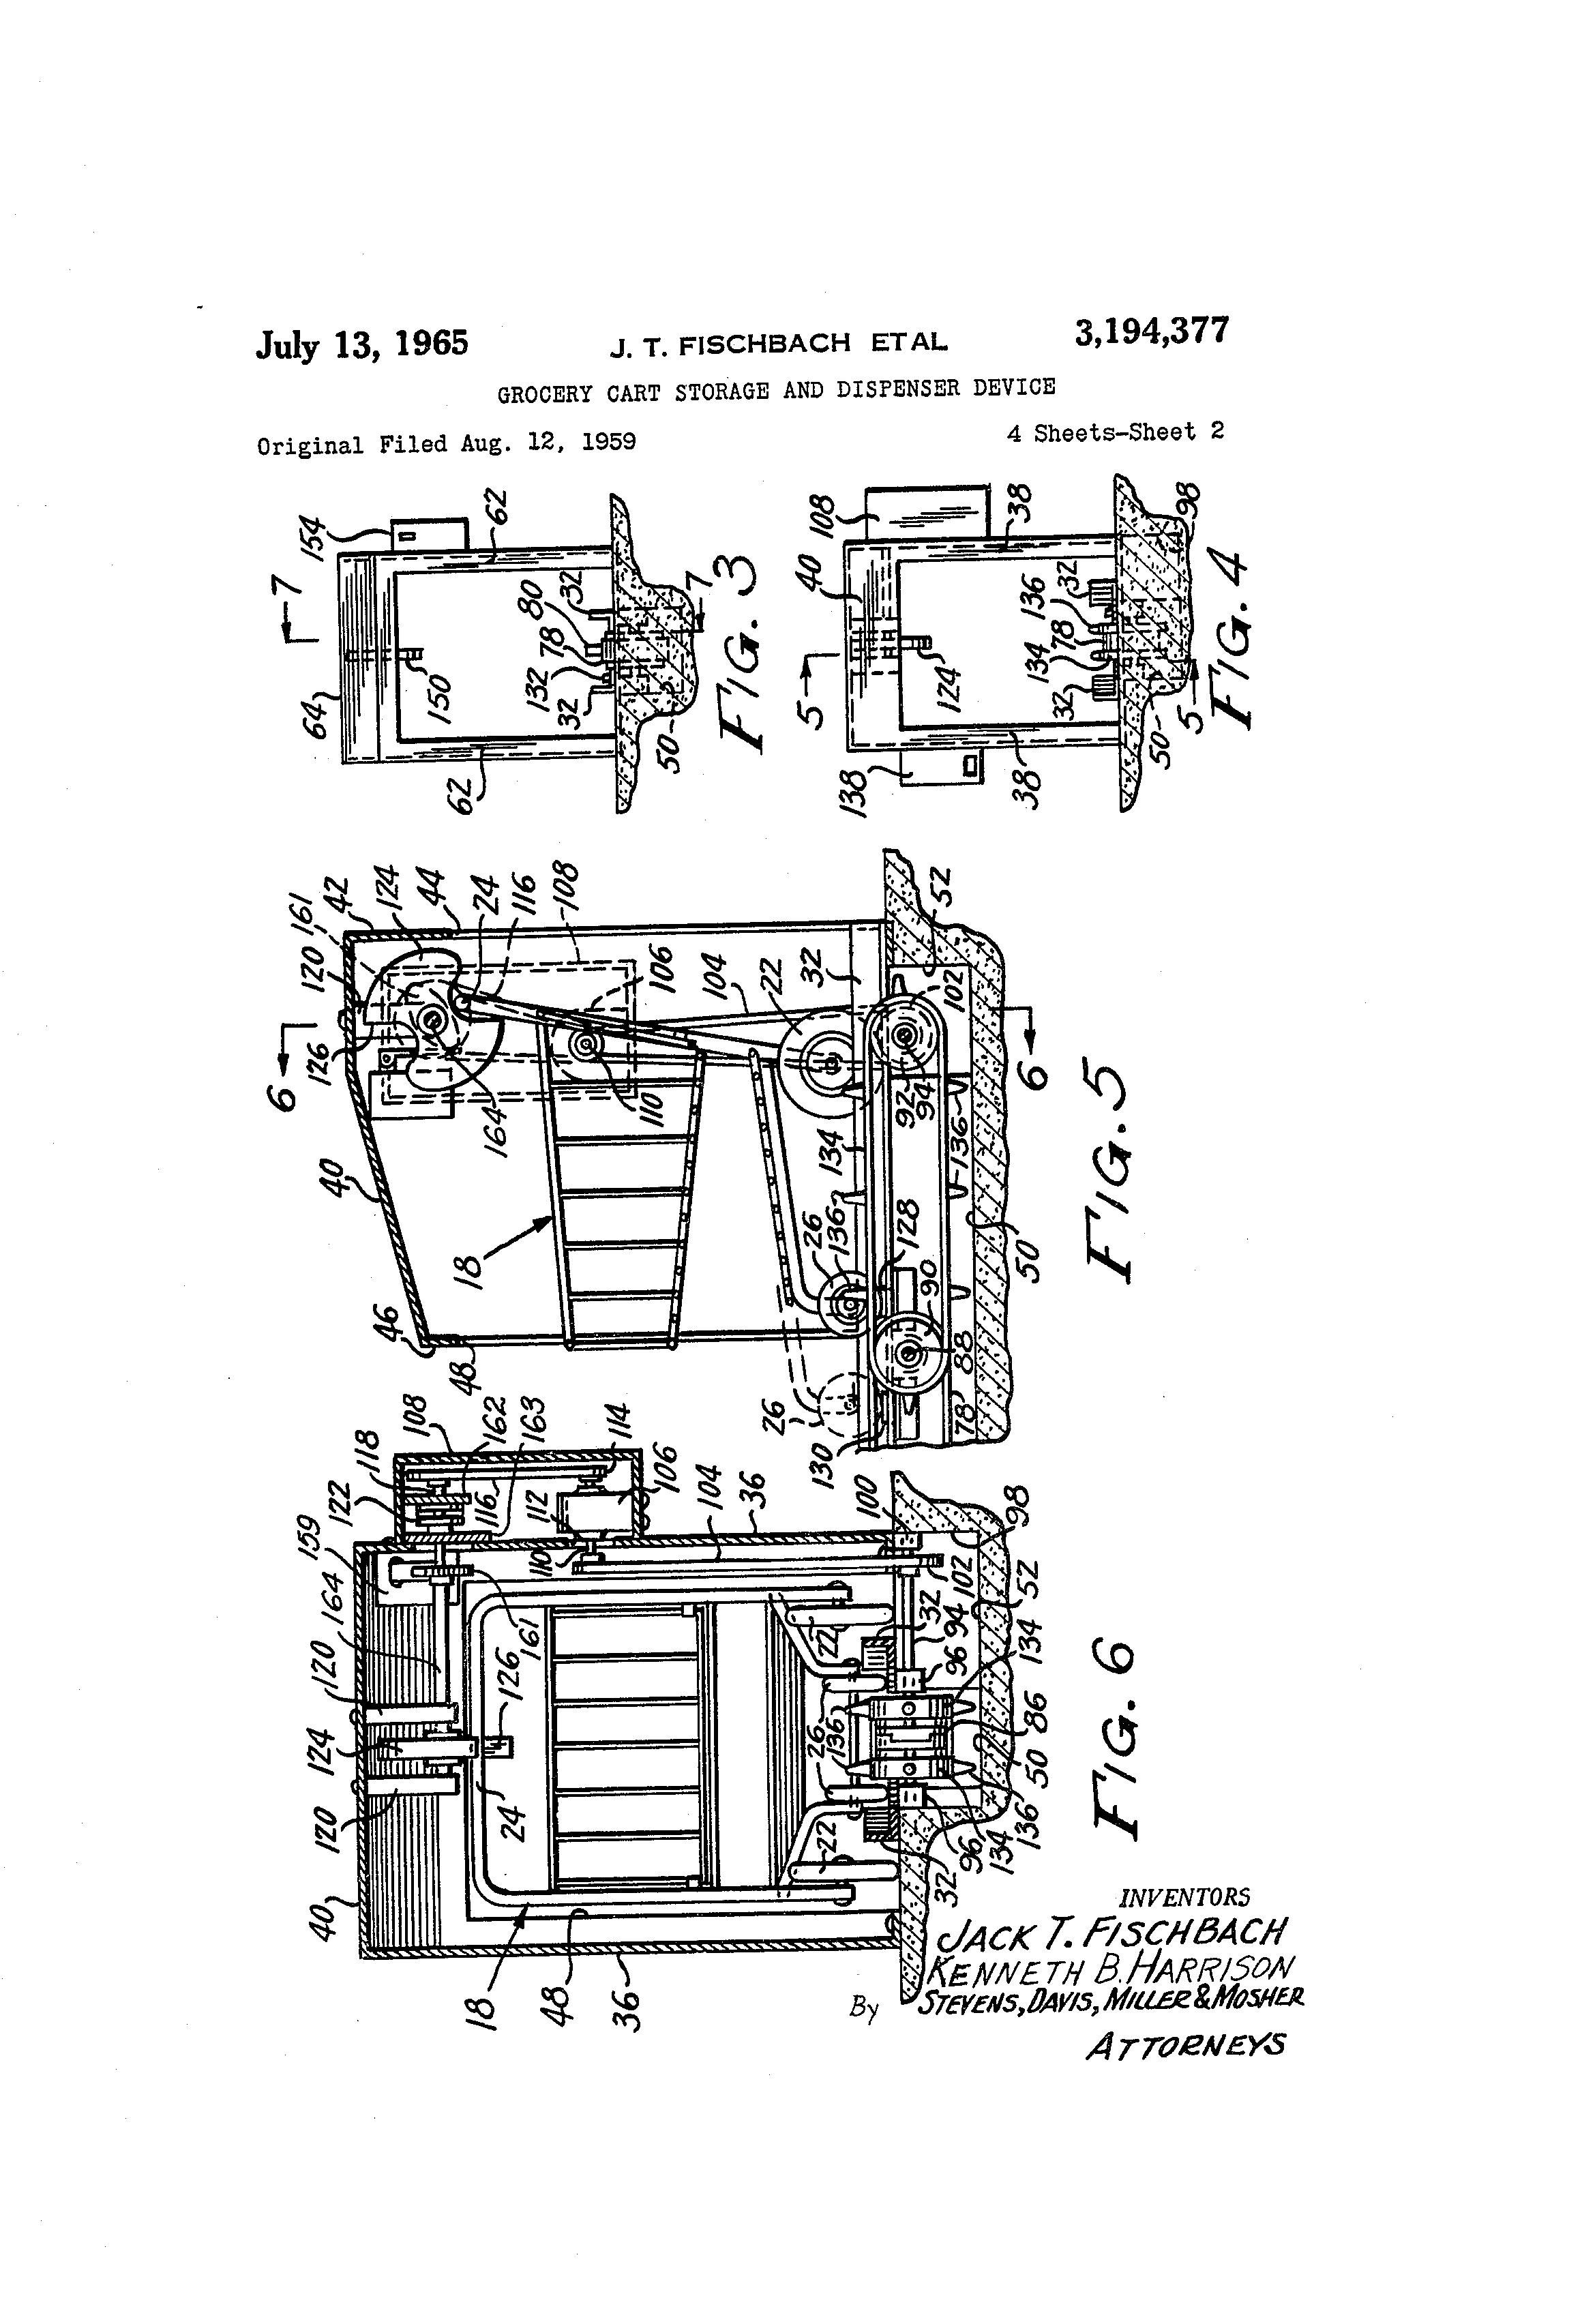 377 Arr Wiring Diagram Mitsubishi 2002 Wiring Diagram Vtx 1300 – John Deere 648h Fuse Box